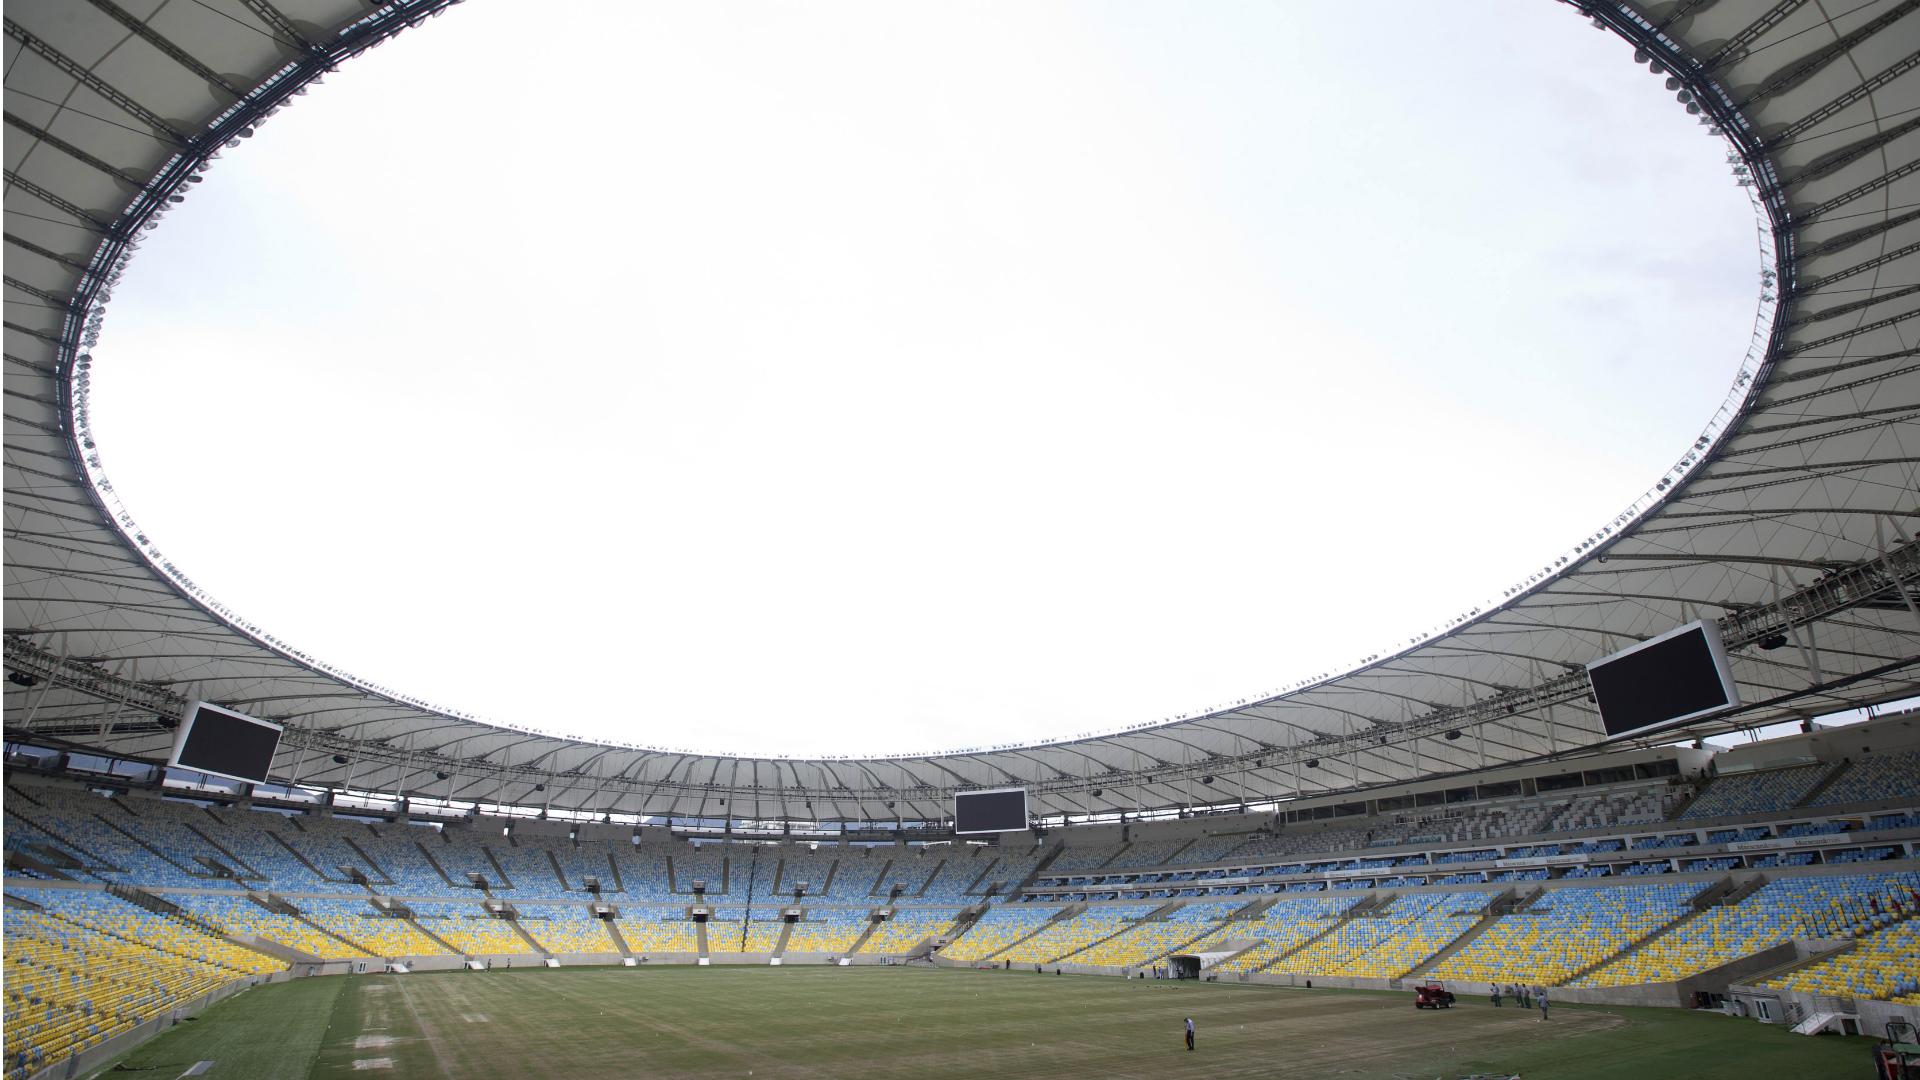 Bazil-stadium-5-26-2014-AP-FTR